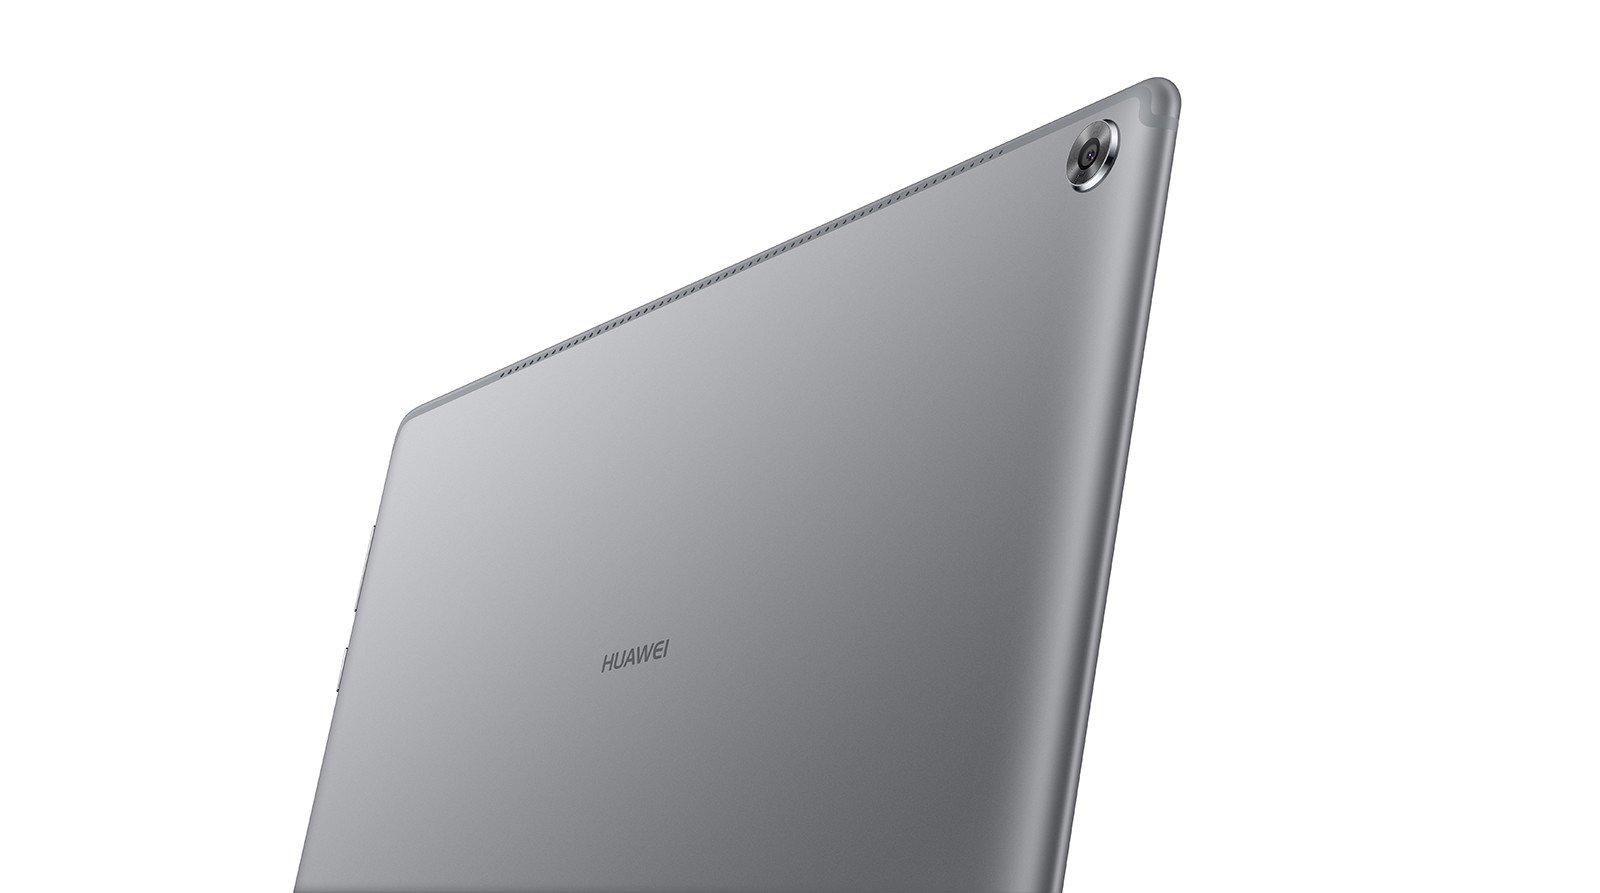 Huawei MediaPad M5 e MediaPad M5 Pro ufficiali: buone